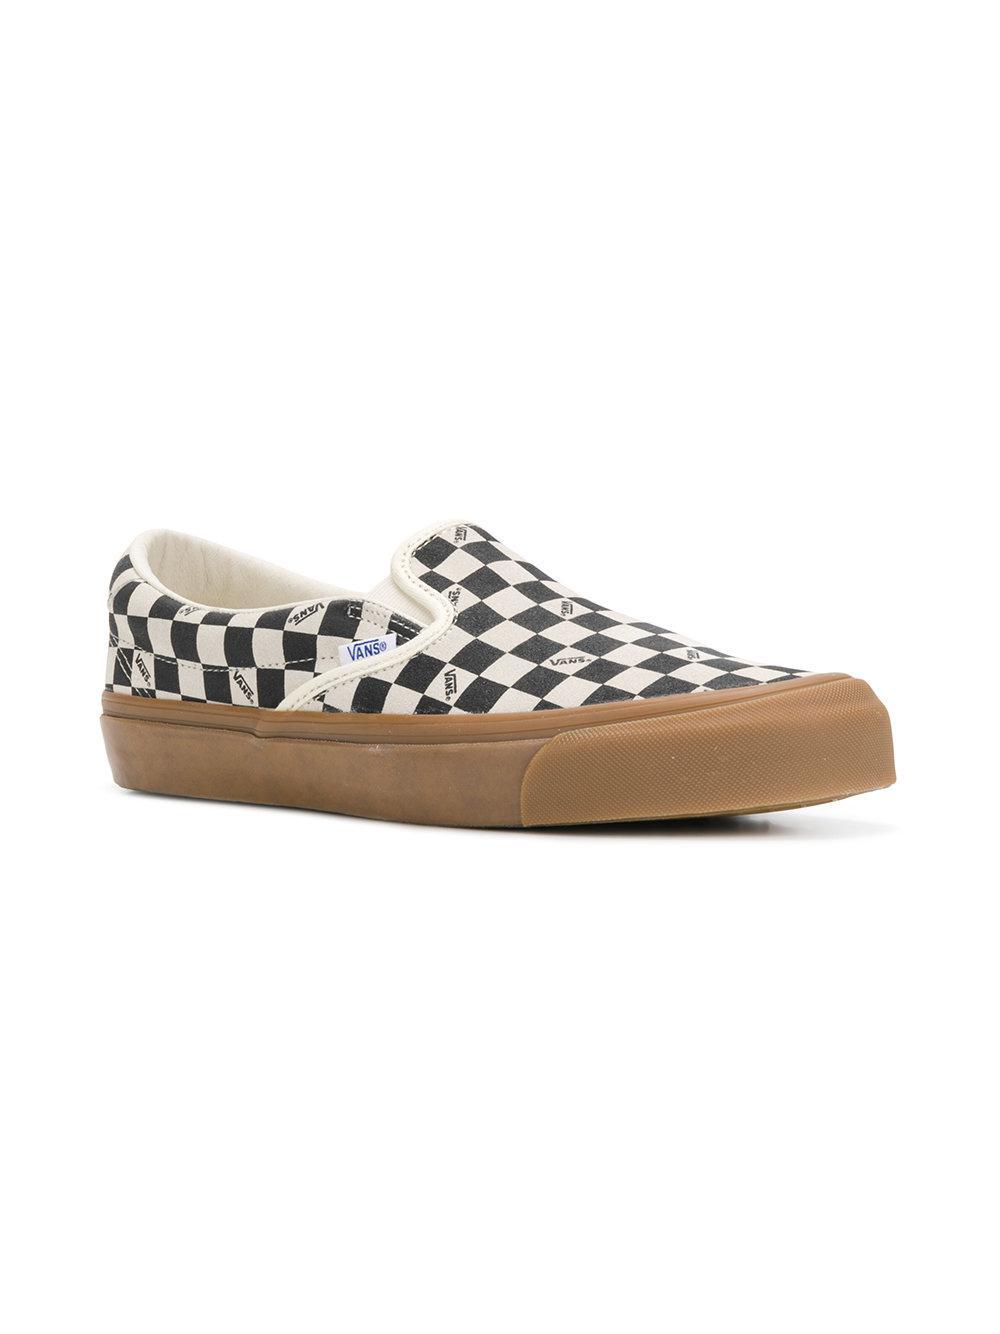 Vans Cotton Checked Slip-on Sneakers in Black